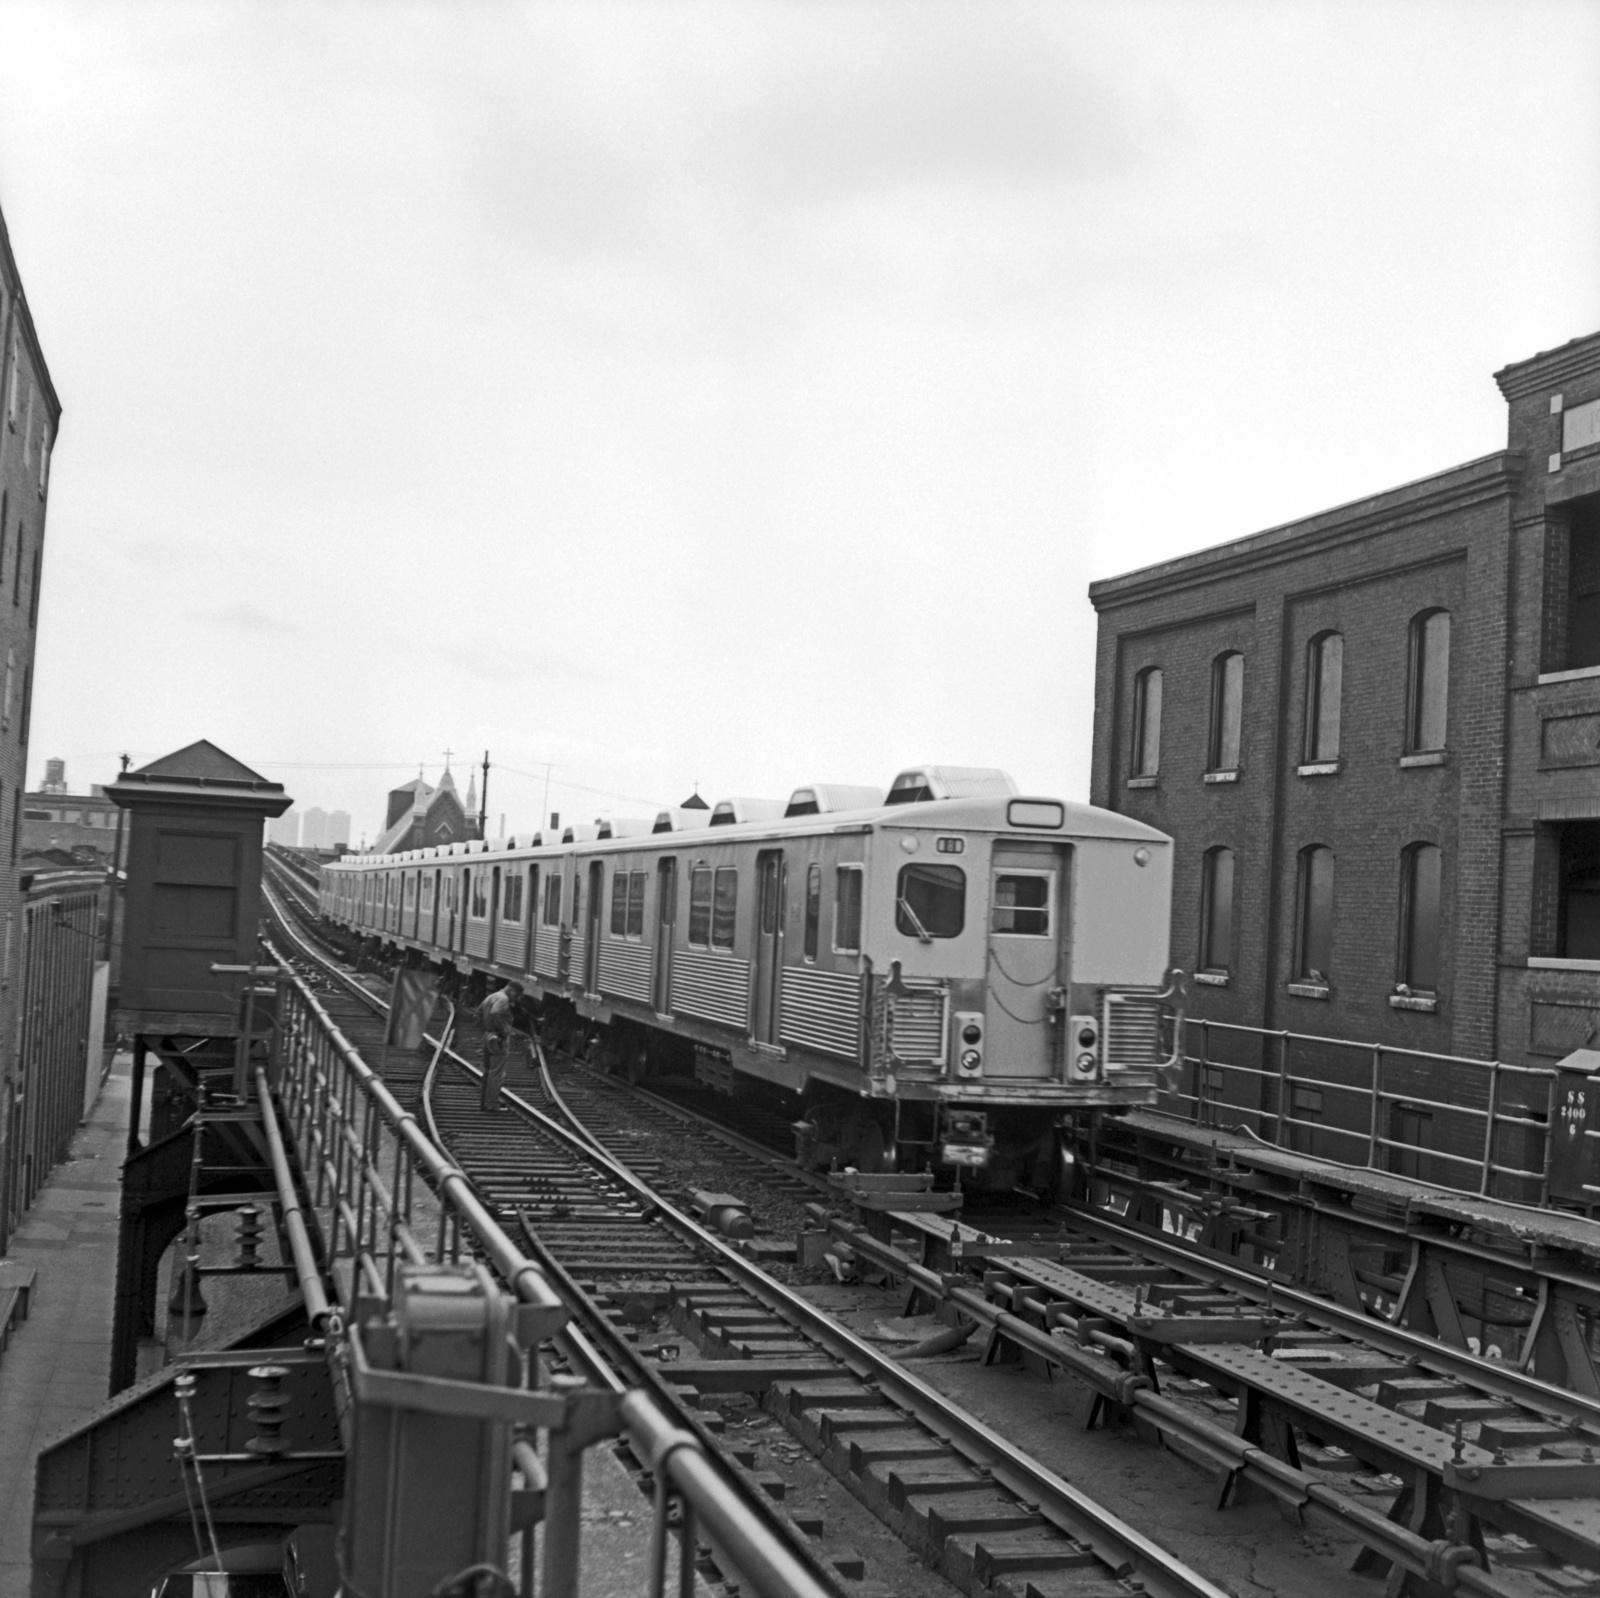 (616k, 1600x1598)<br><b>Country:</b> United States<br><b>City:</b> Philadelphia, PA<br><b>System:</b> SEPTA (or Predecessor)<br><b>Line:</b> Market-Frankford El<br><b>Location:</b> Girard<br><b>Car:</b> SEPTA M-3 (Budd, 1960)  <br><b>Collection of:</b> David Pirmann<br><b>Date:</b> 10/12/1968<br><b>Viewed (this week/total):</b> 2 / 55